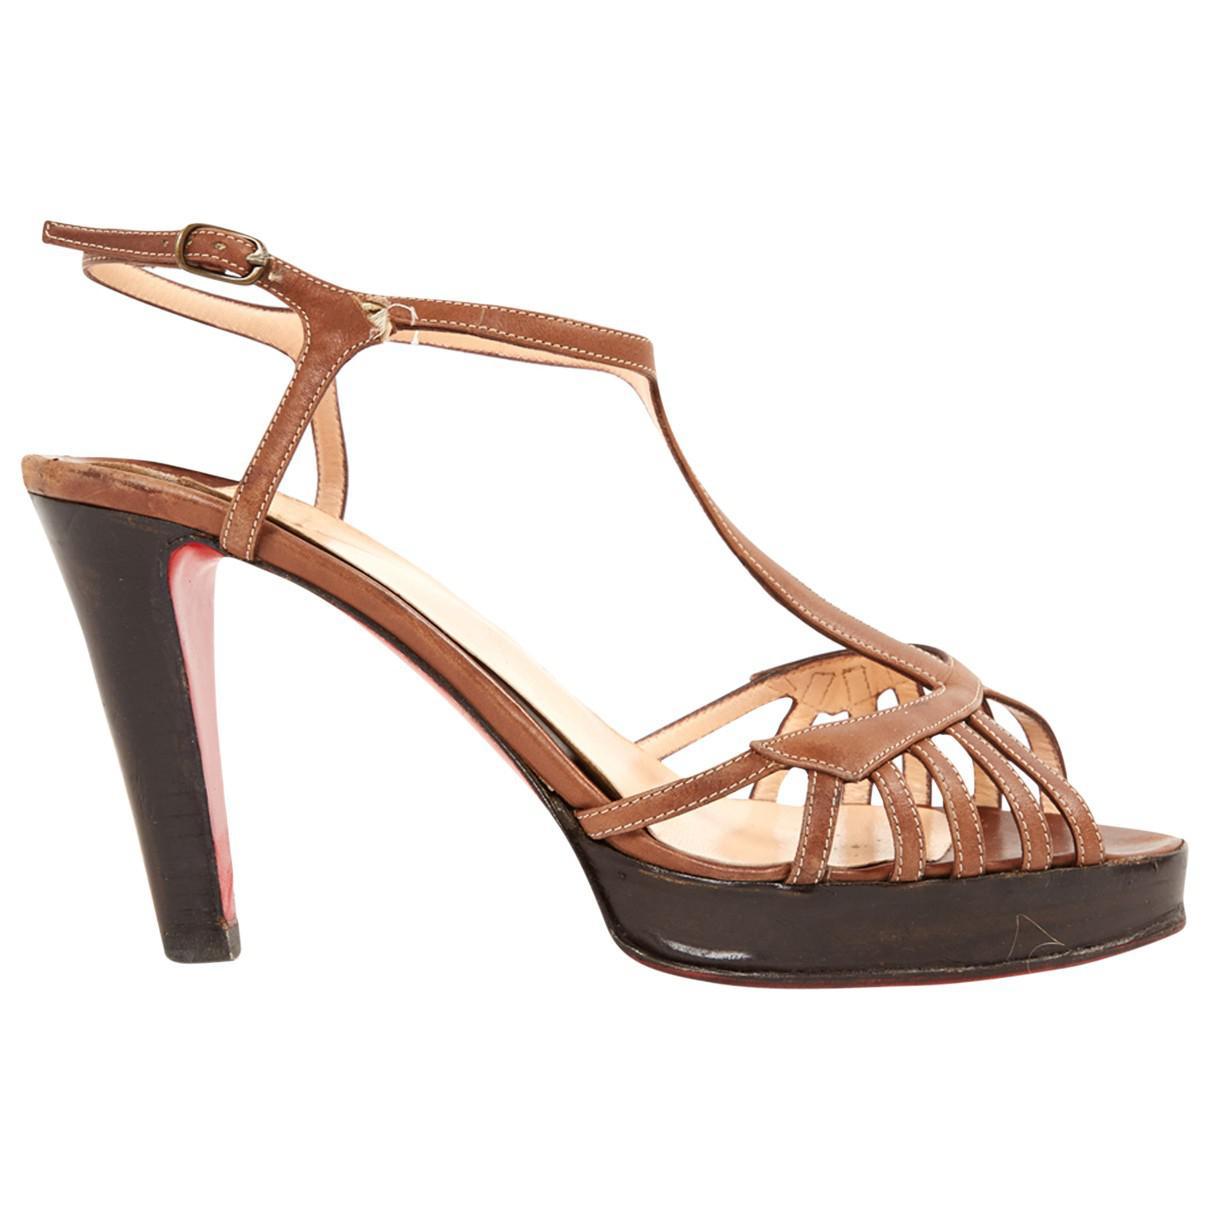 Cheap Sale View Pre-owned - Leather sandals Christian Louboutin Cheap Sale Original Choice Online oCutahGPr